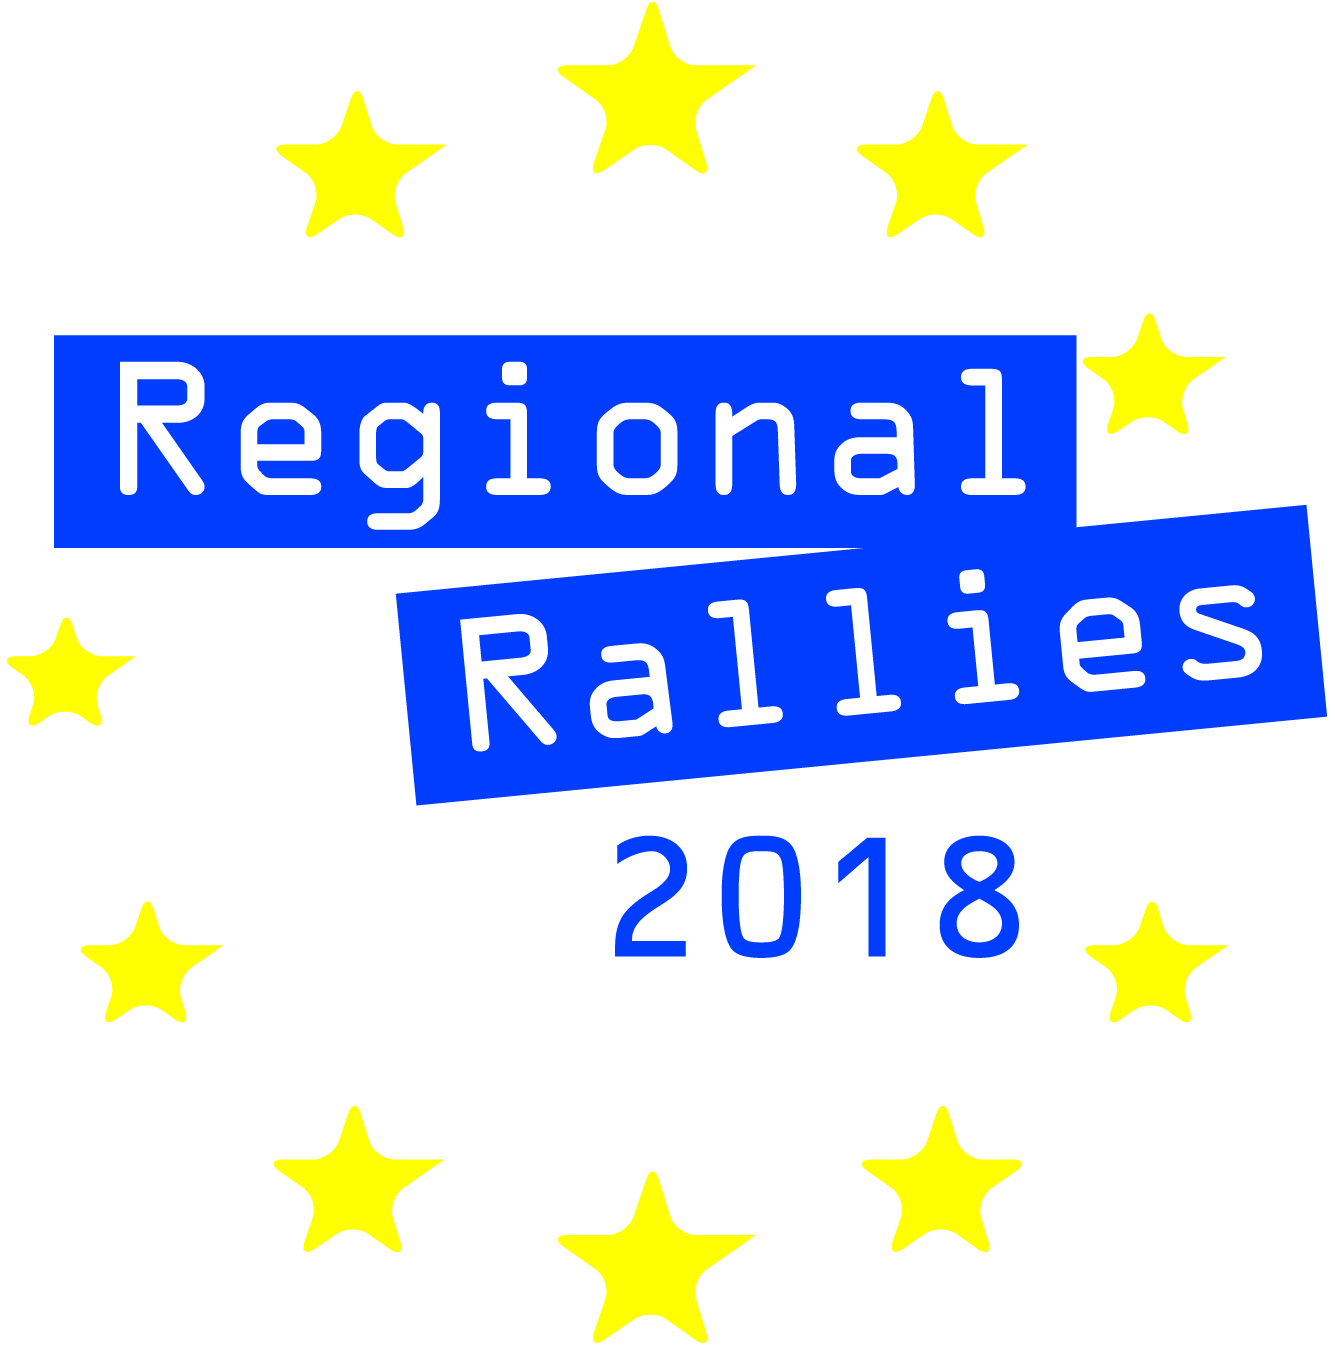 Regional_Rallies_logo_(002).jpg